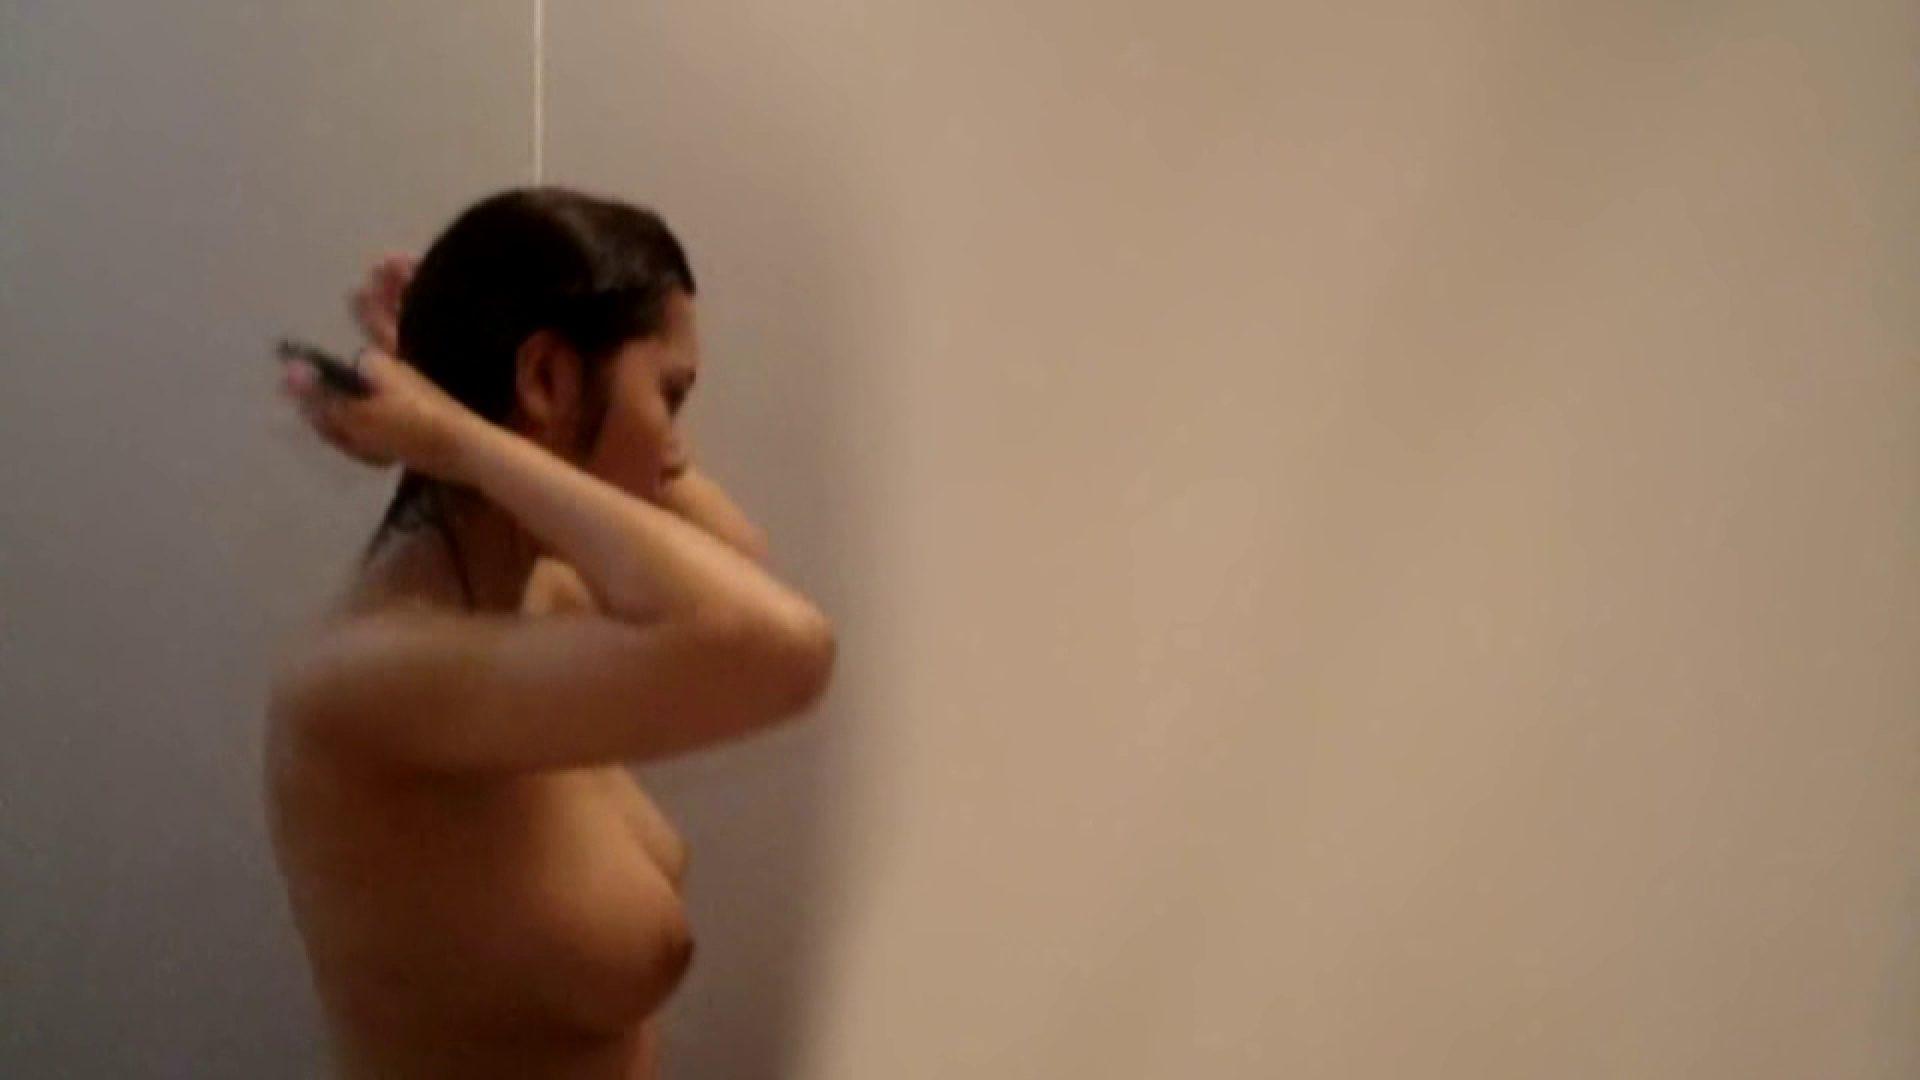 vol.2 葵のグラドル顔負けの爆乳を入浴シーンでどうぞ。 巨乳 エロ無料画像 111画像 69